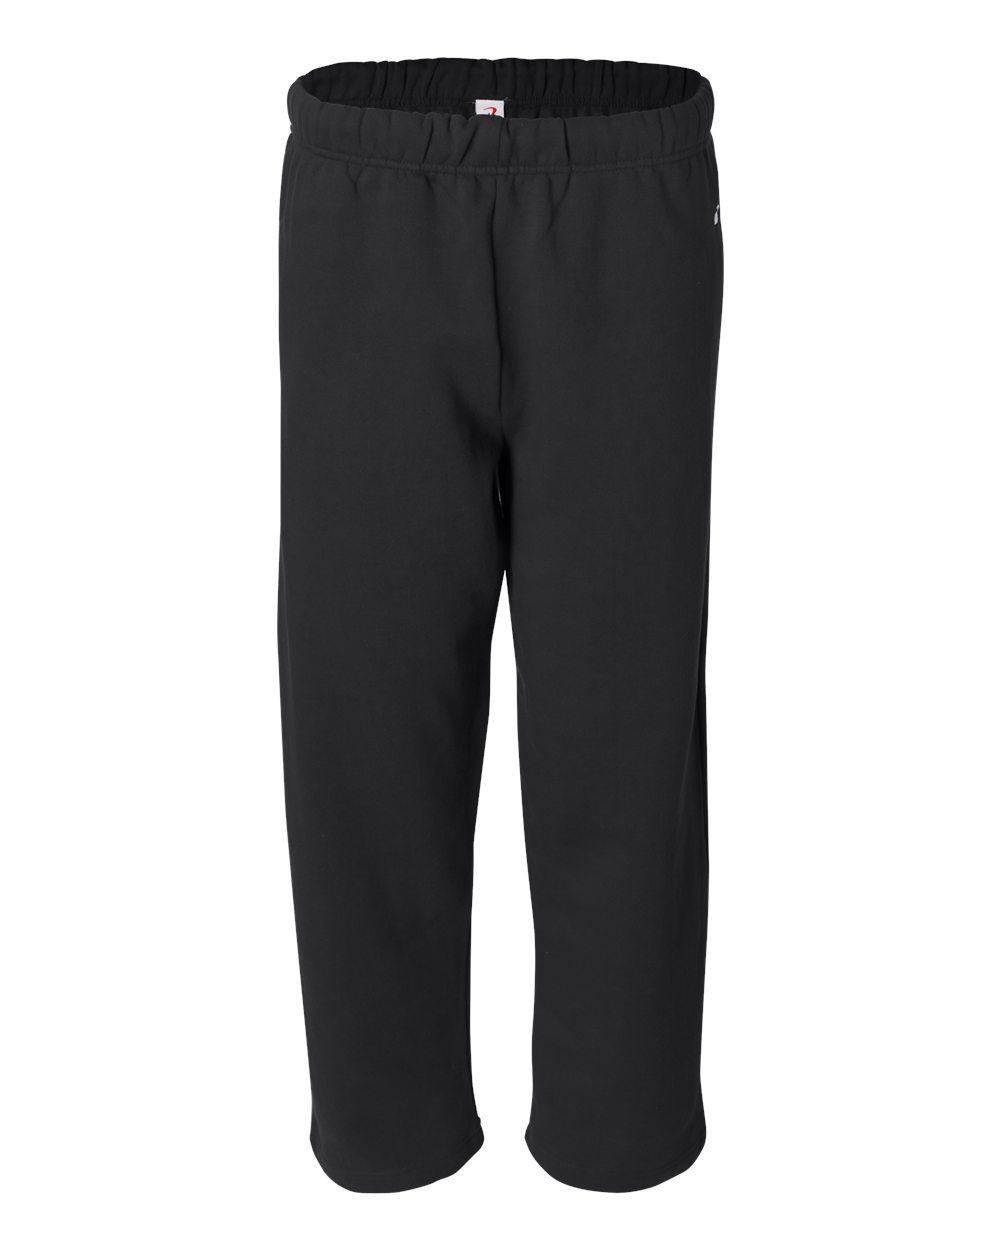 C2 Sport 5577 Open-Bottom Sweatpants